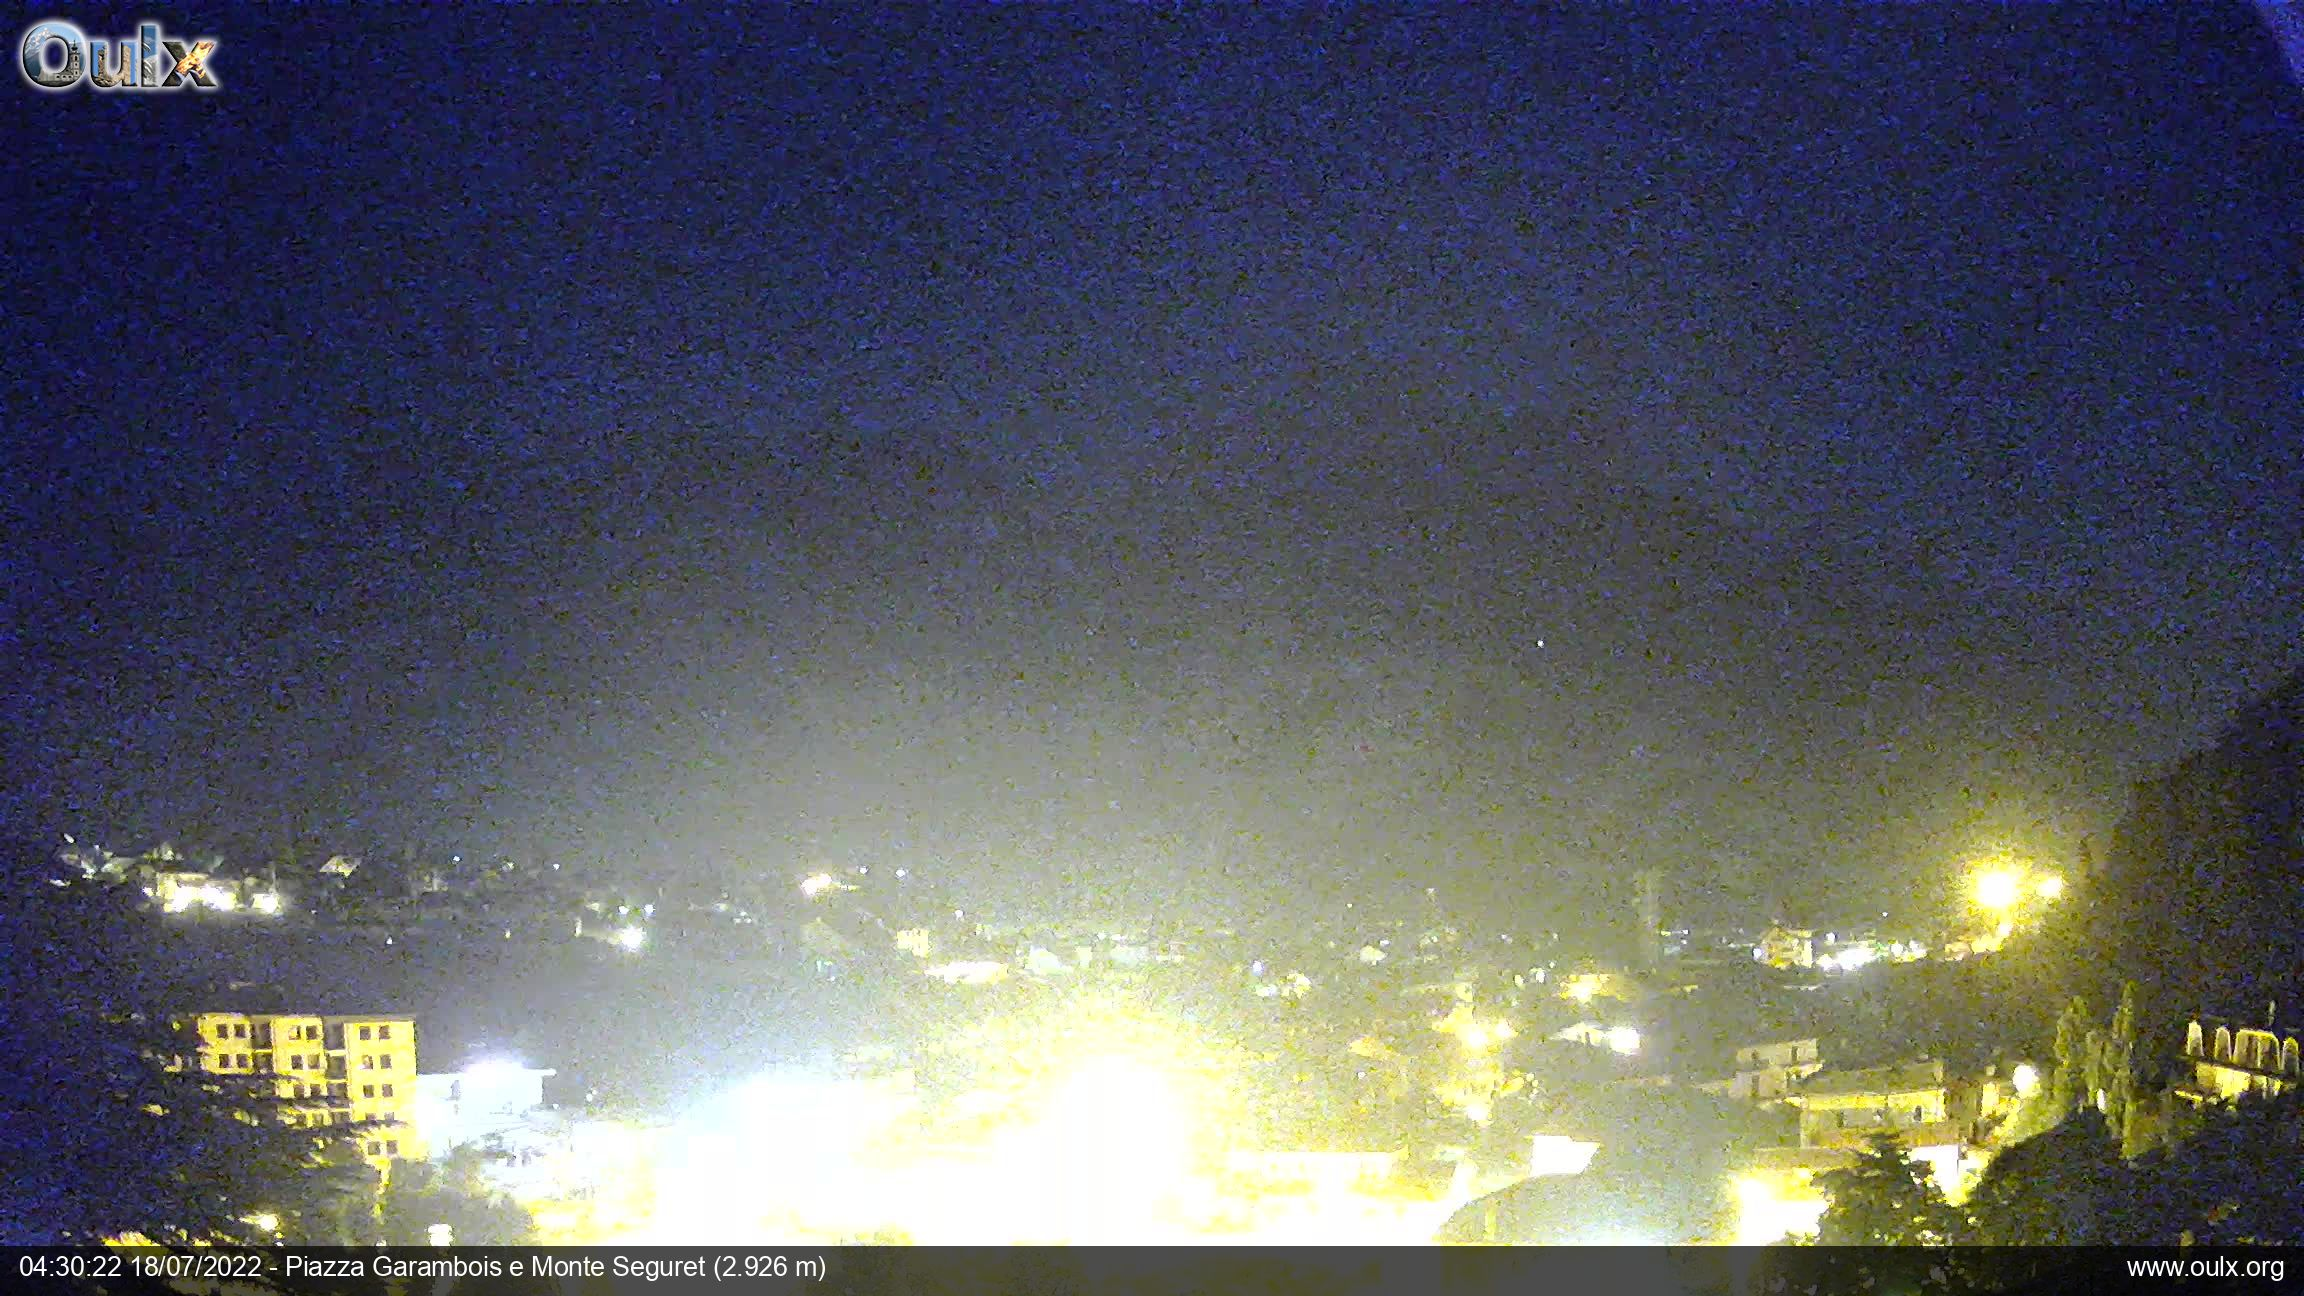 http://www.oulx.org/webcam/oulx_ipcamd.jpg?time=1417524019523